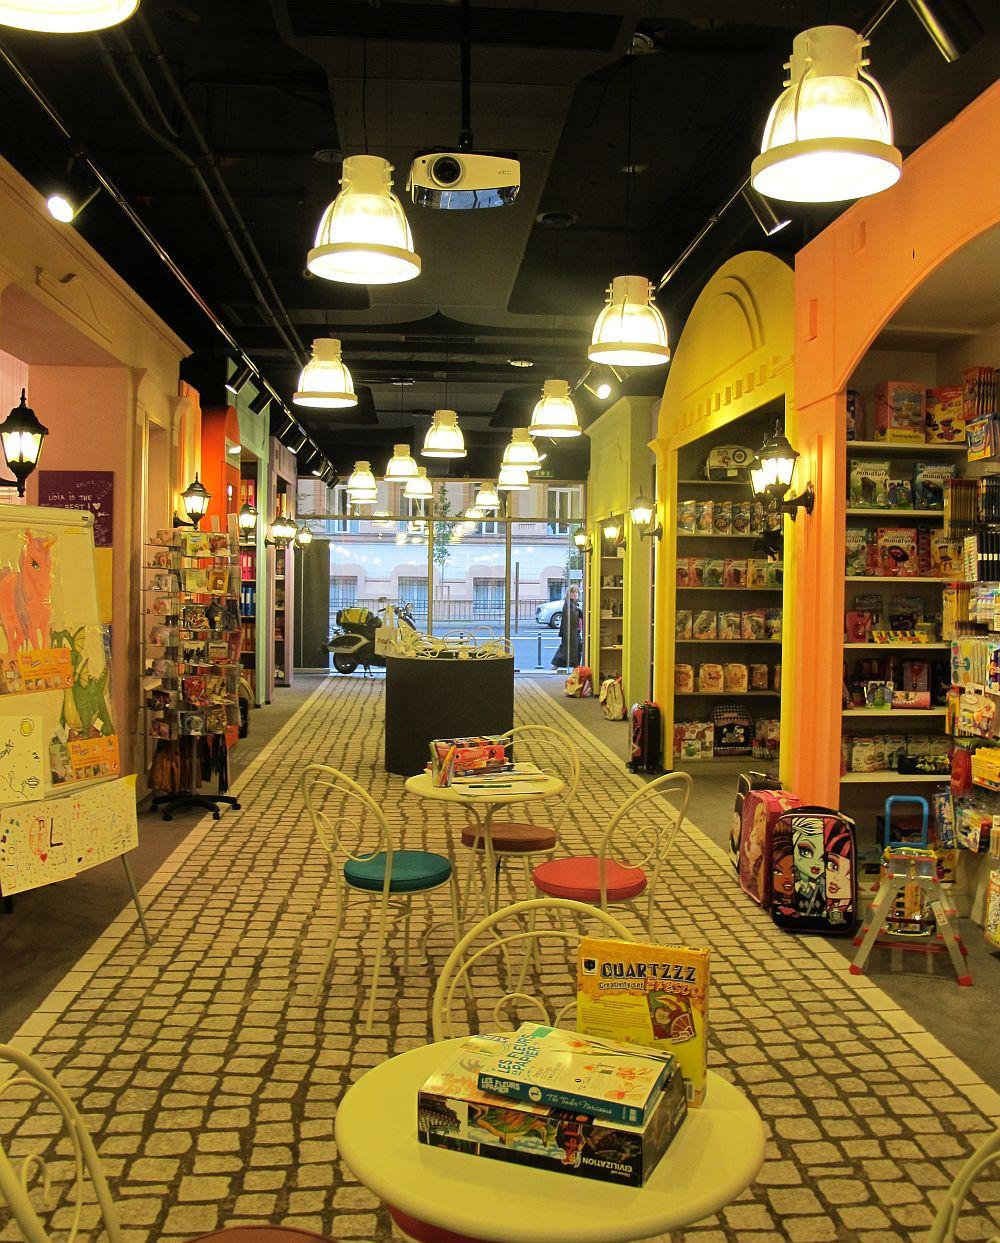 adelaparvu.com despre concept store papetarie Lolol, Dacris, design interior Prographic Studio Bucuresti (15)